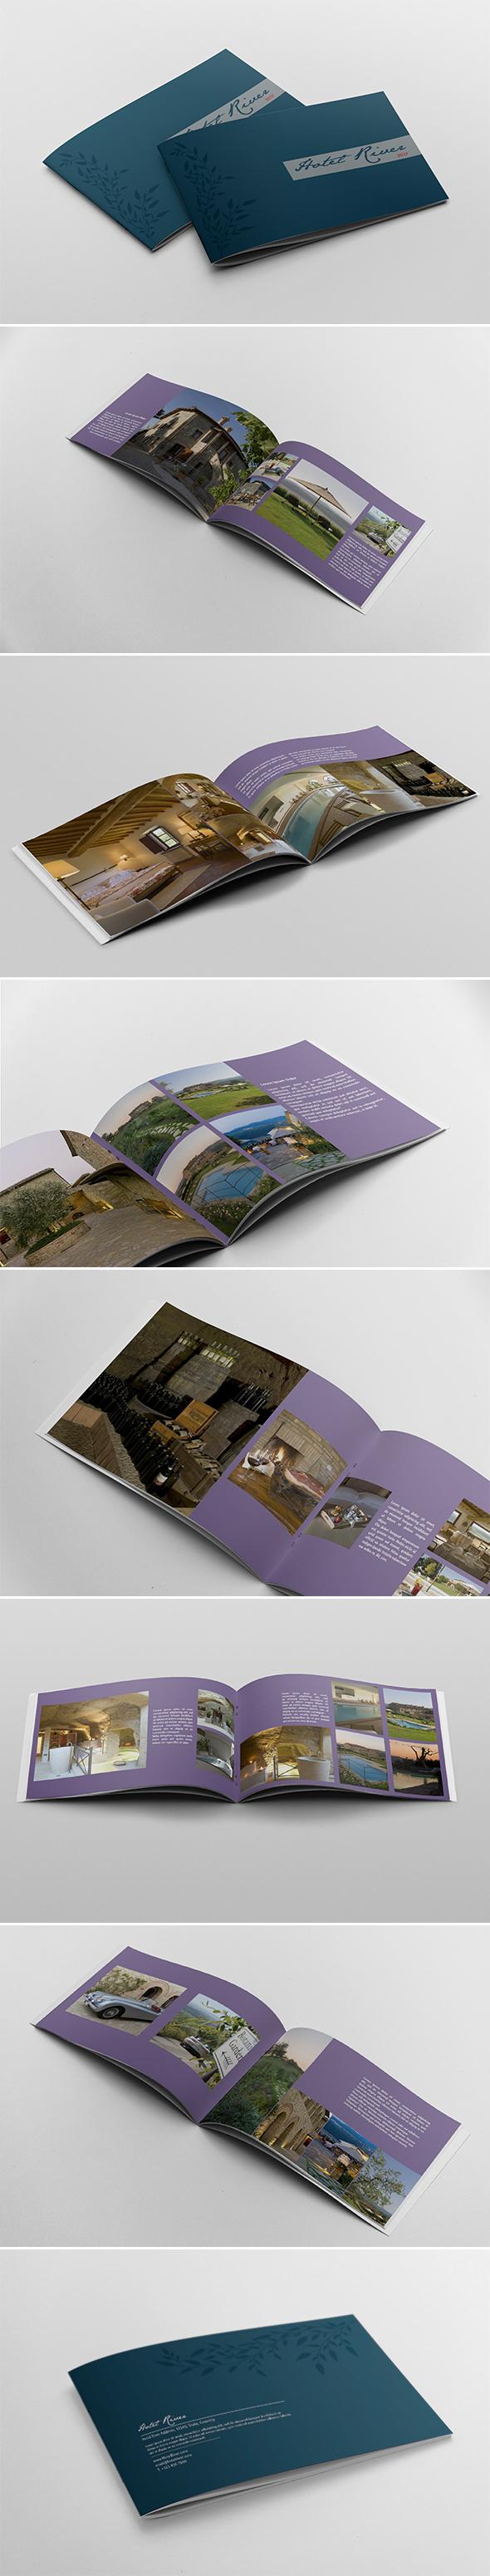 Booklet / Brochure Template